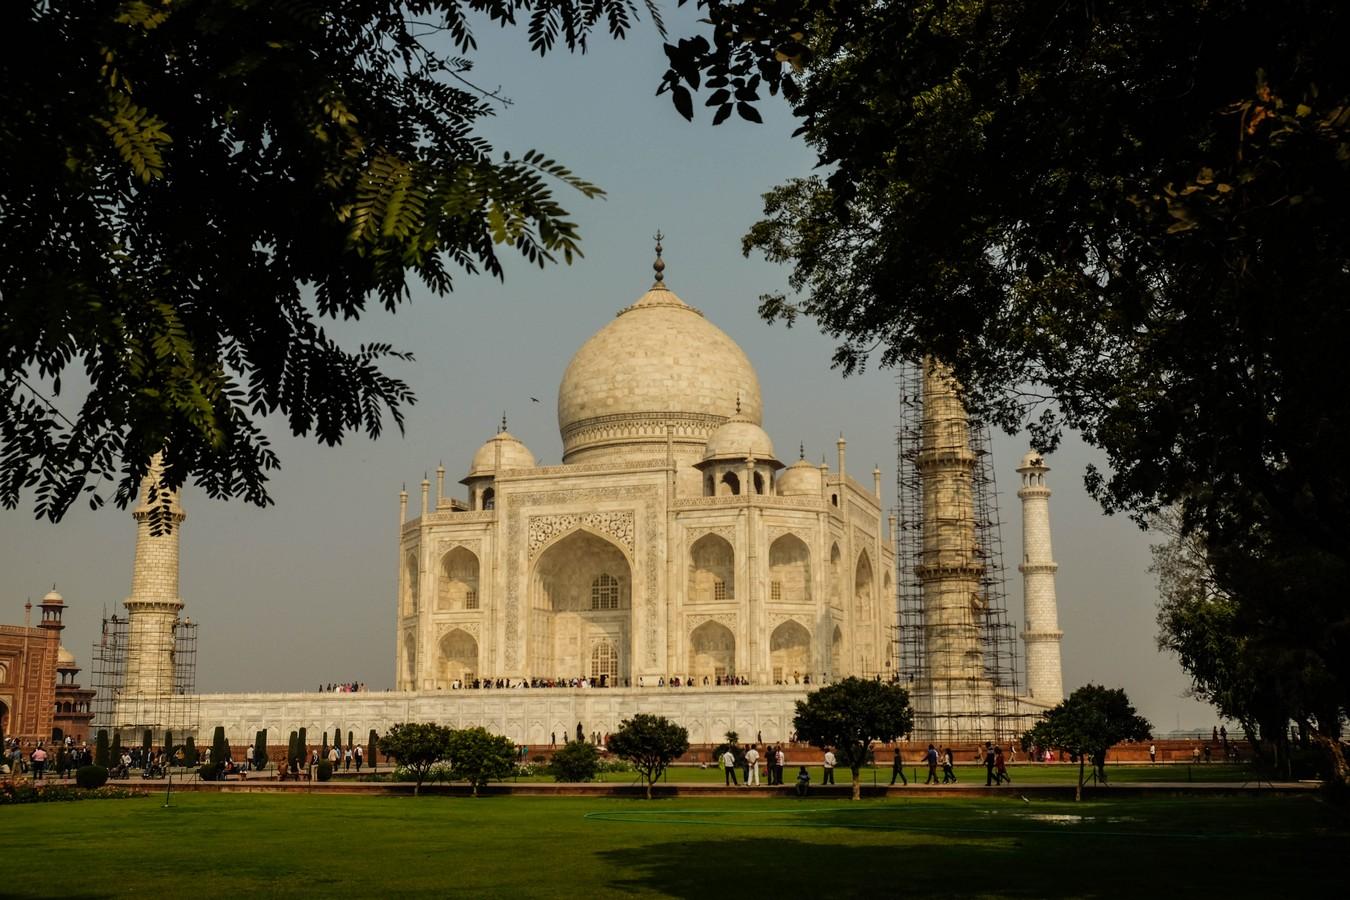 Vue du Taj Mahal depuis ses jardins